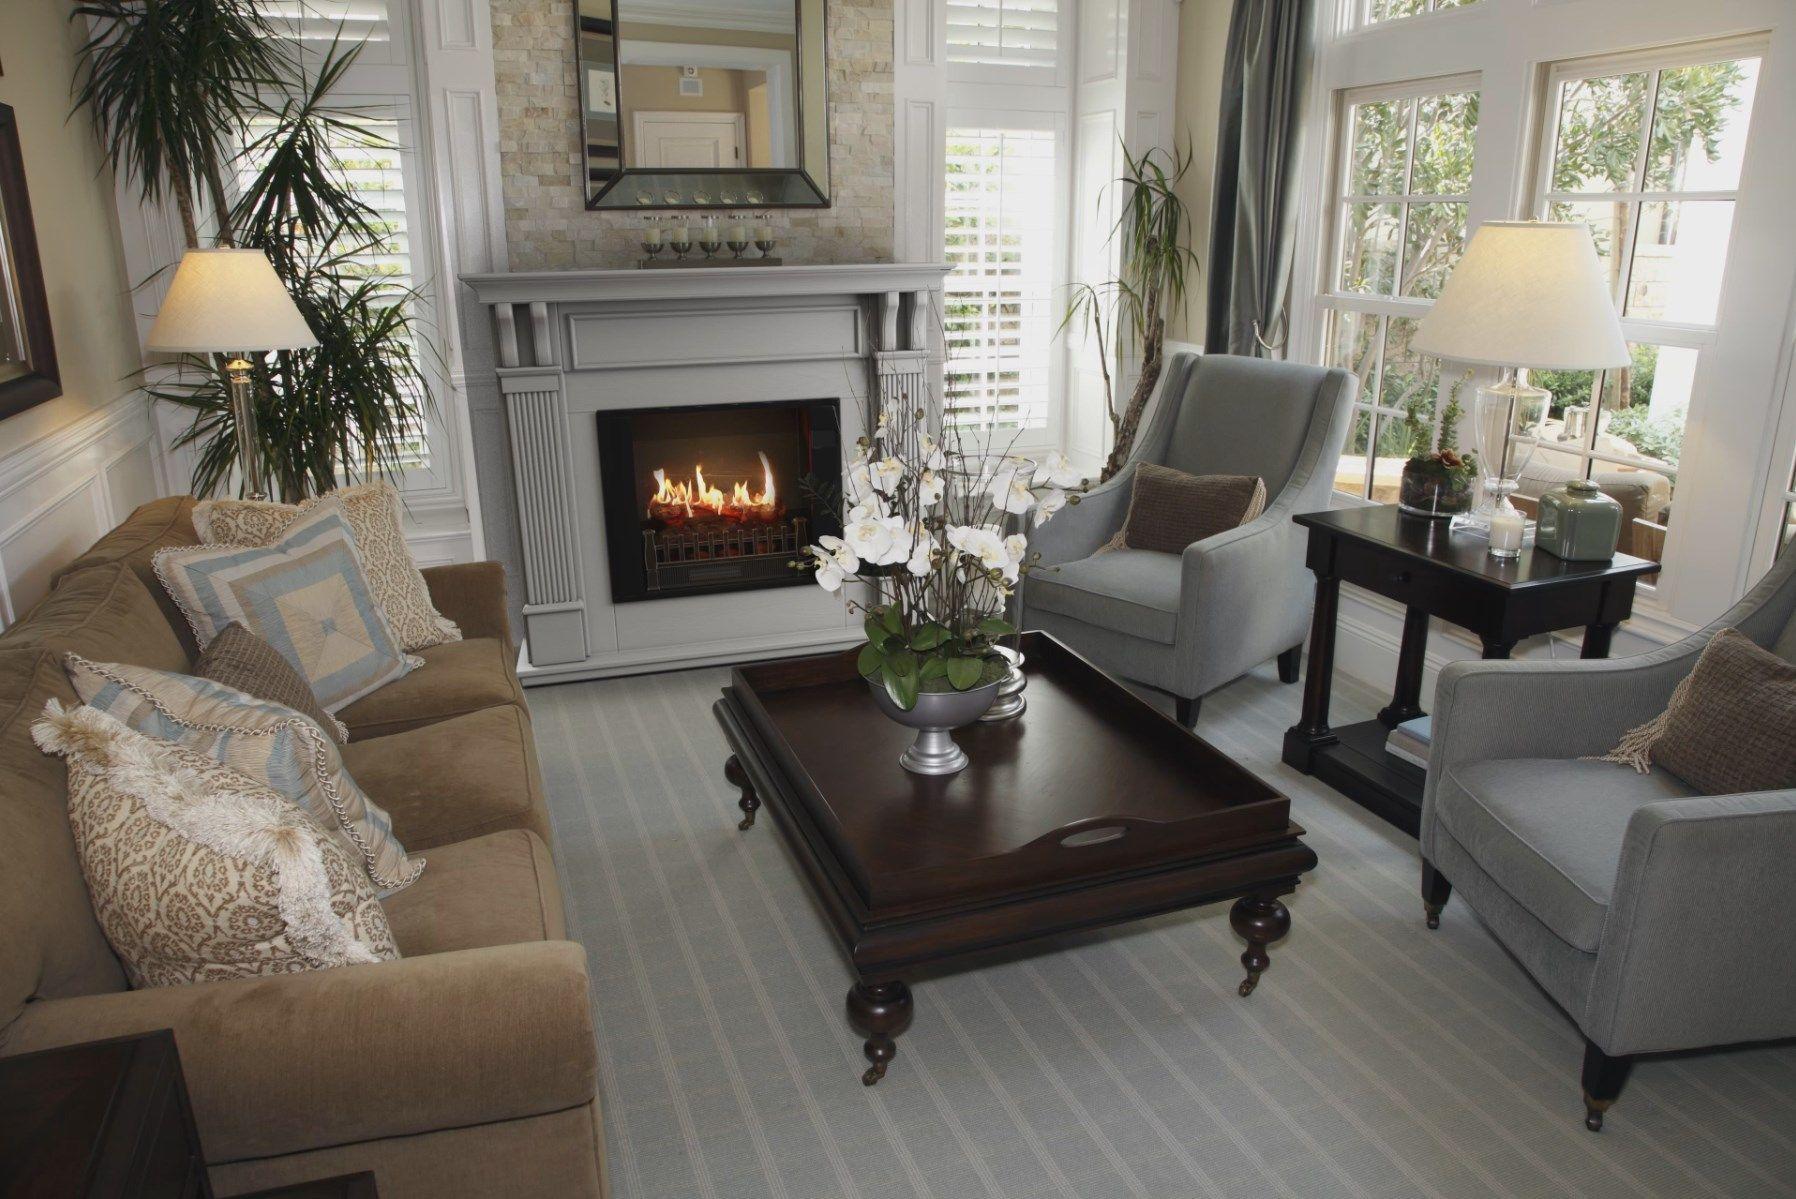 Buy White Electric Fireplace Formal Living Room Decor Li